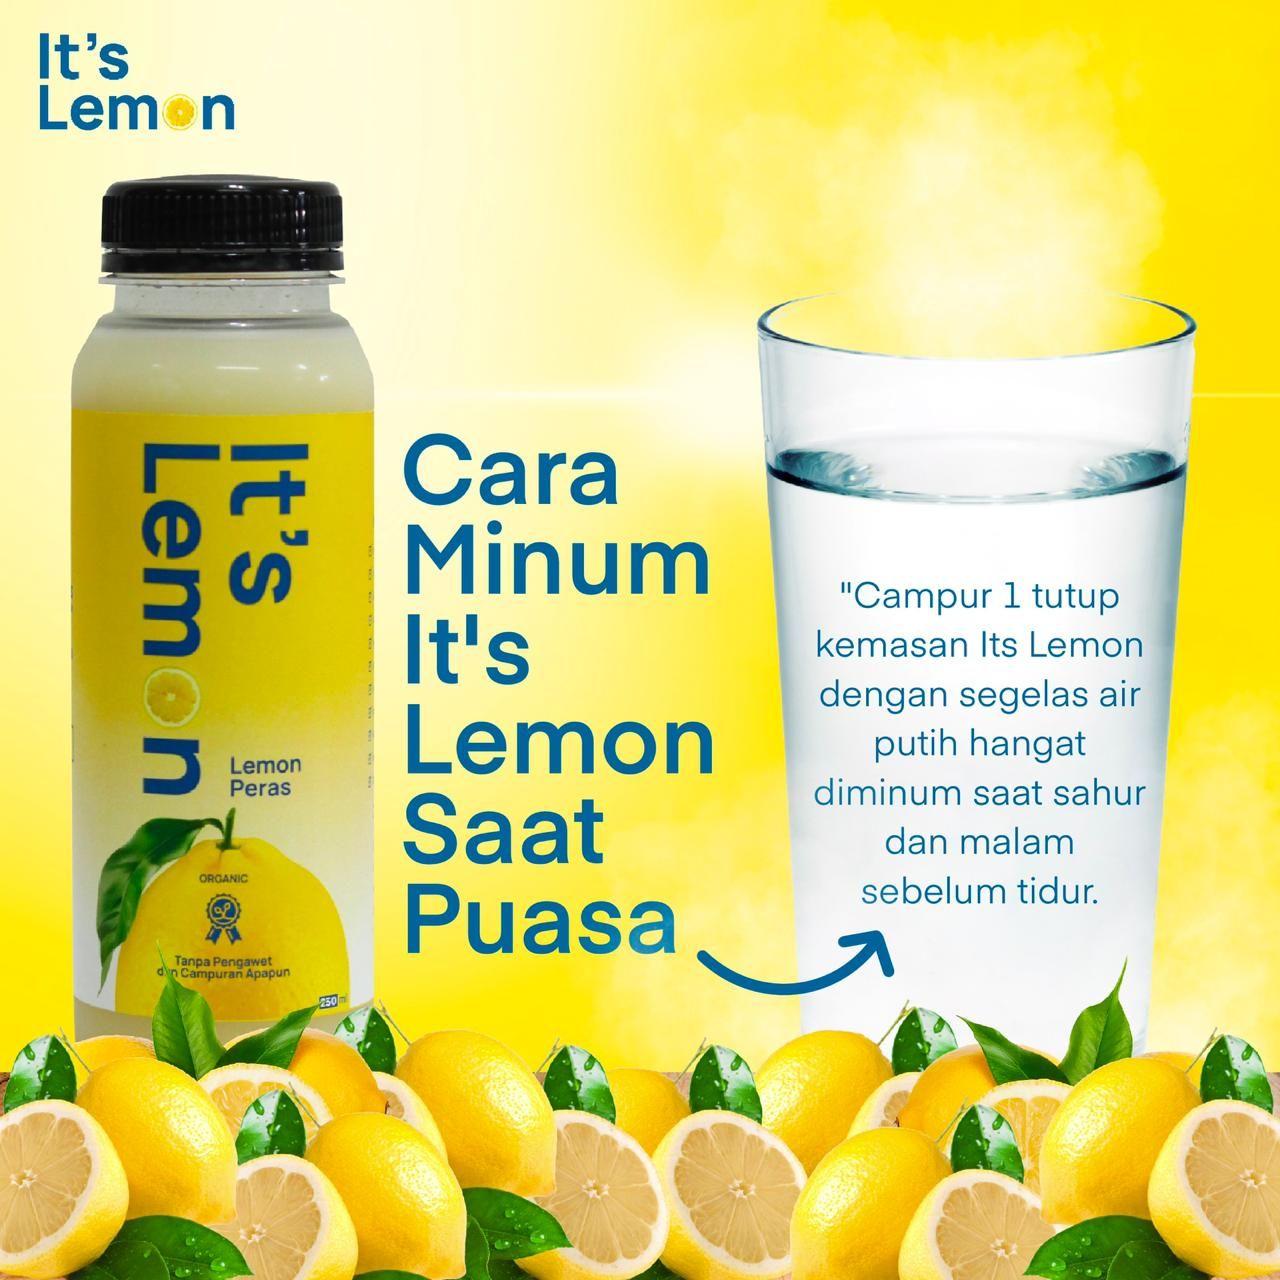 Wa Me 6281394808616 Terbaik Jual Sari Jeruk Lemon Banten Minuman Campuran Lemon Minuman